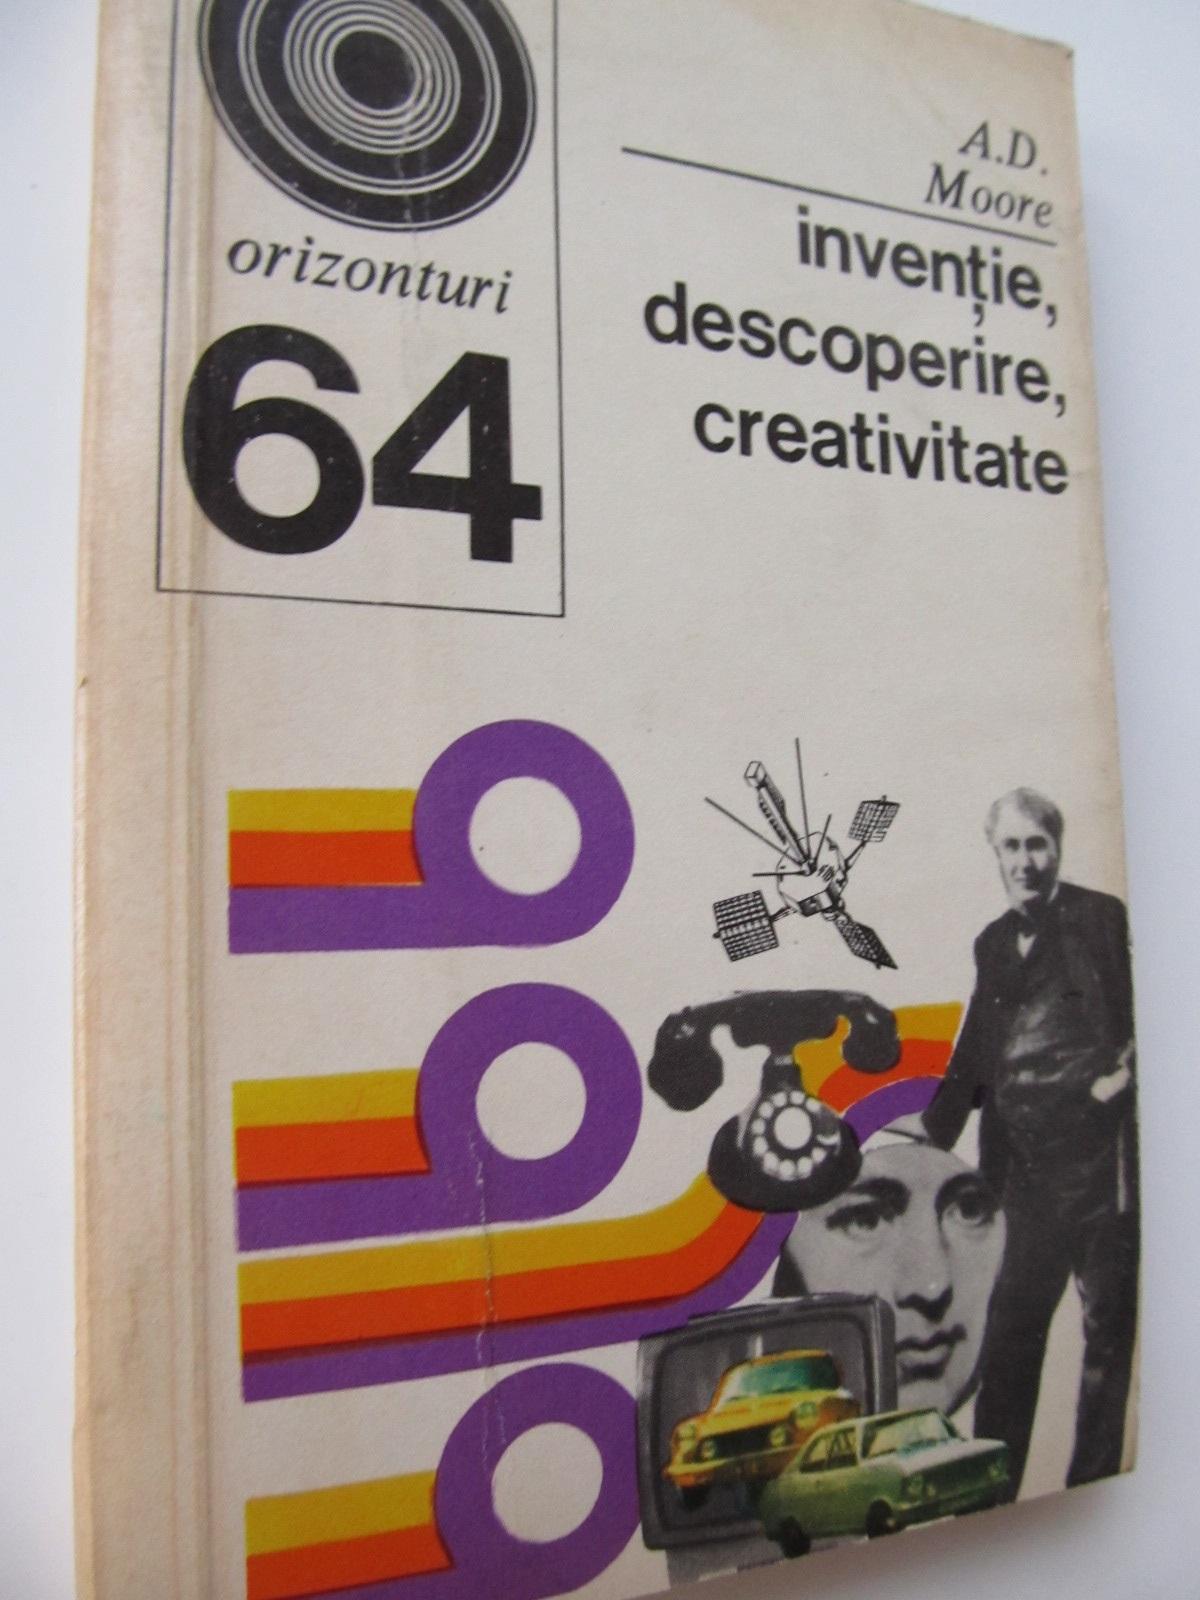 Inventie descoperire creativitate - A. D. Moore | Detalii carte